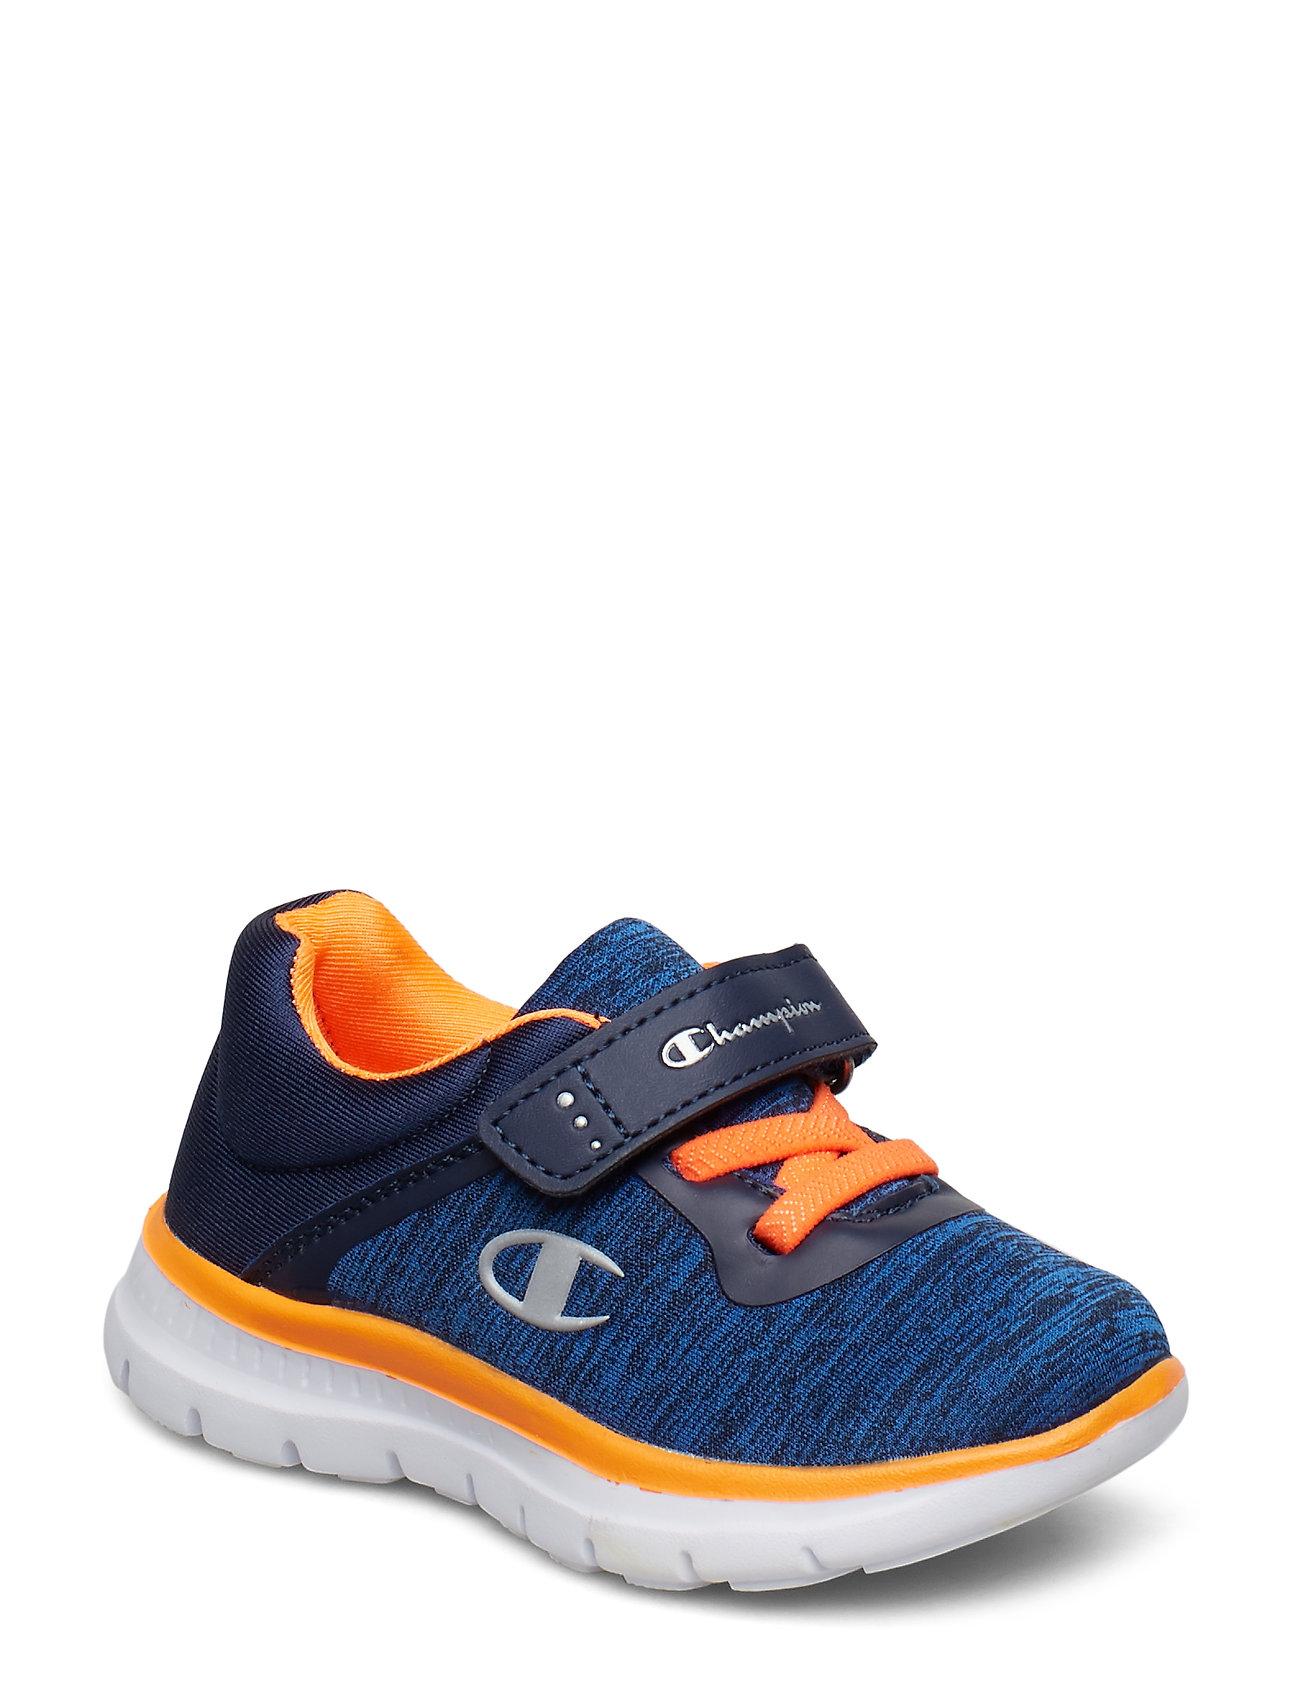 Champion Low Cut Shoe SOFTY B TD - SKY CAPTAIN